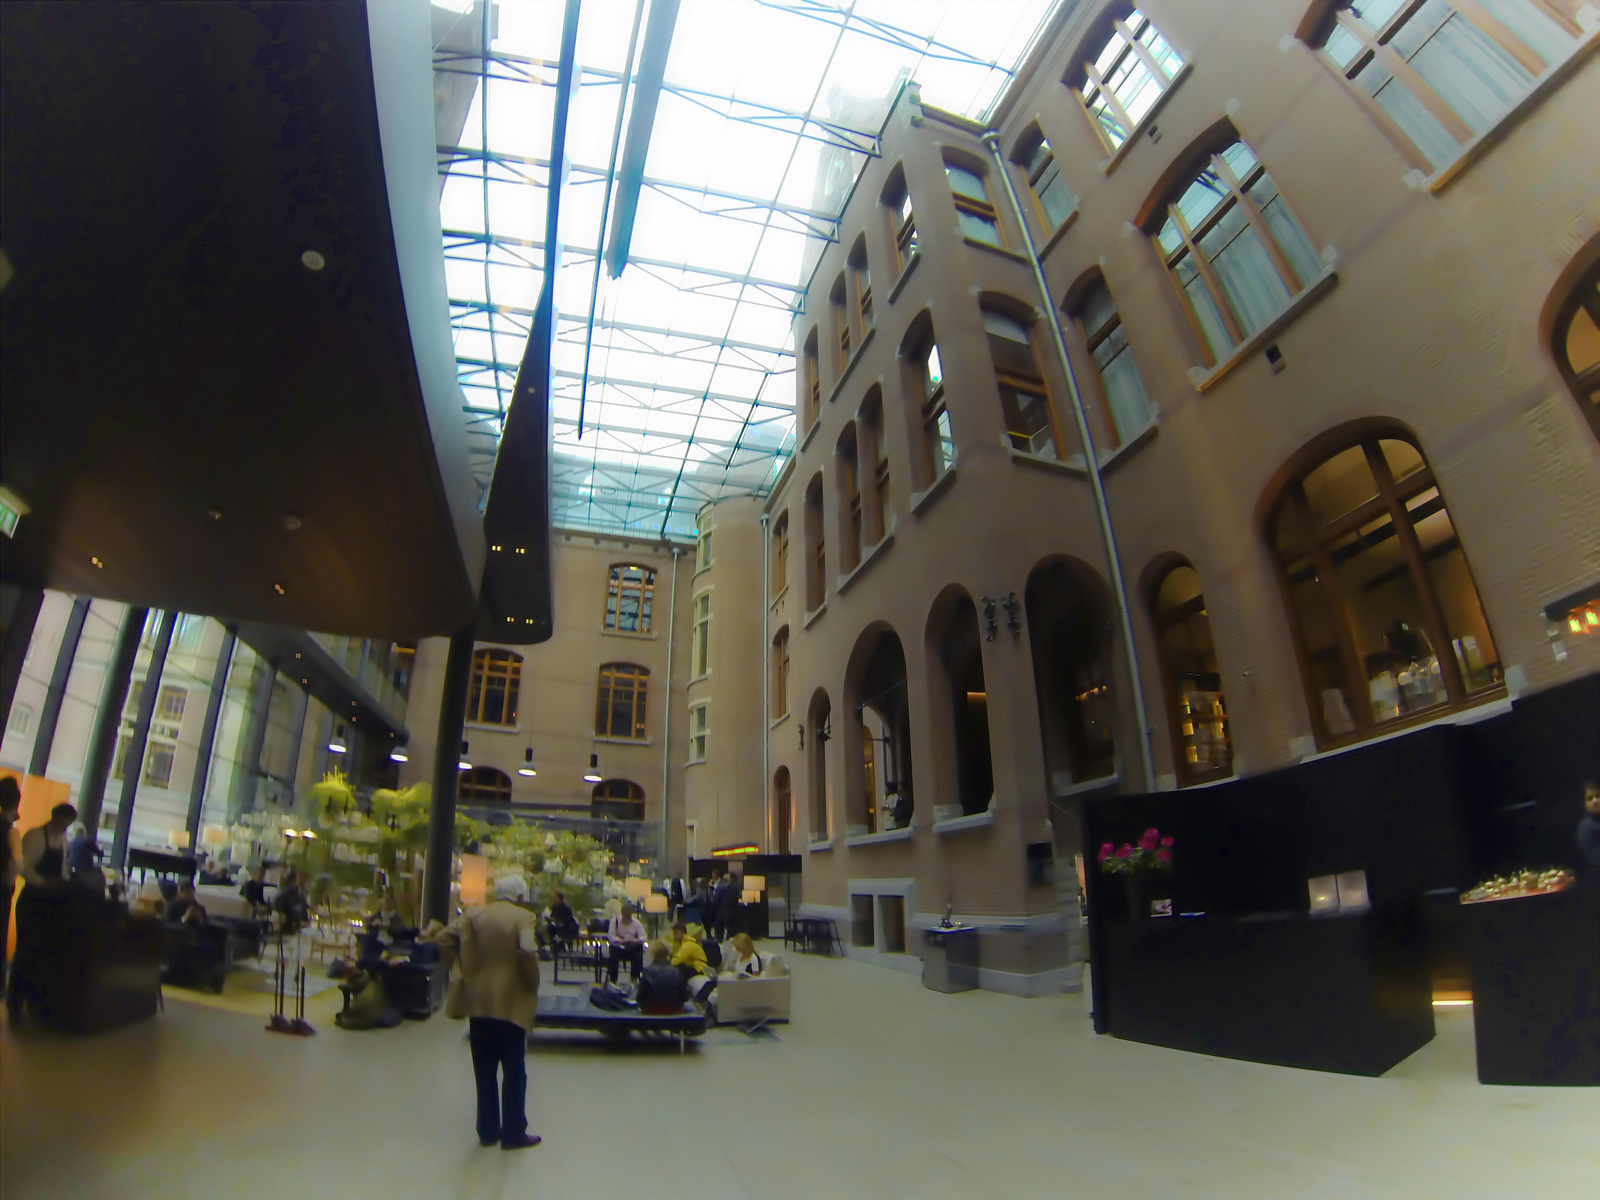 couryard-exterior-old-music-conservatory-modern-lobby-front-desk-conservatorium-hotel-amsterdam.jpg